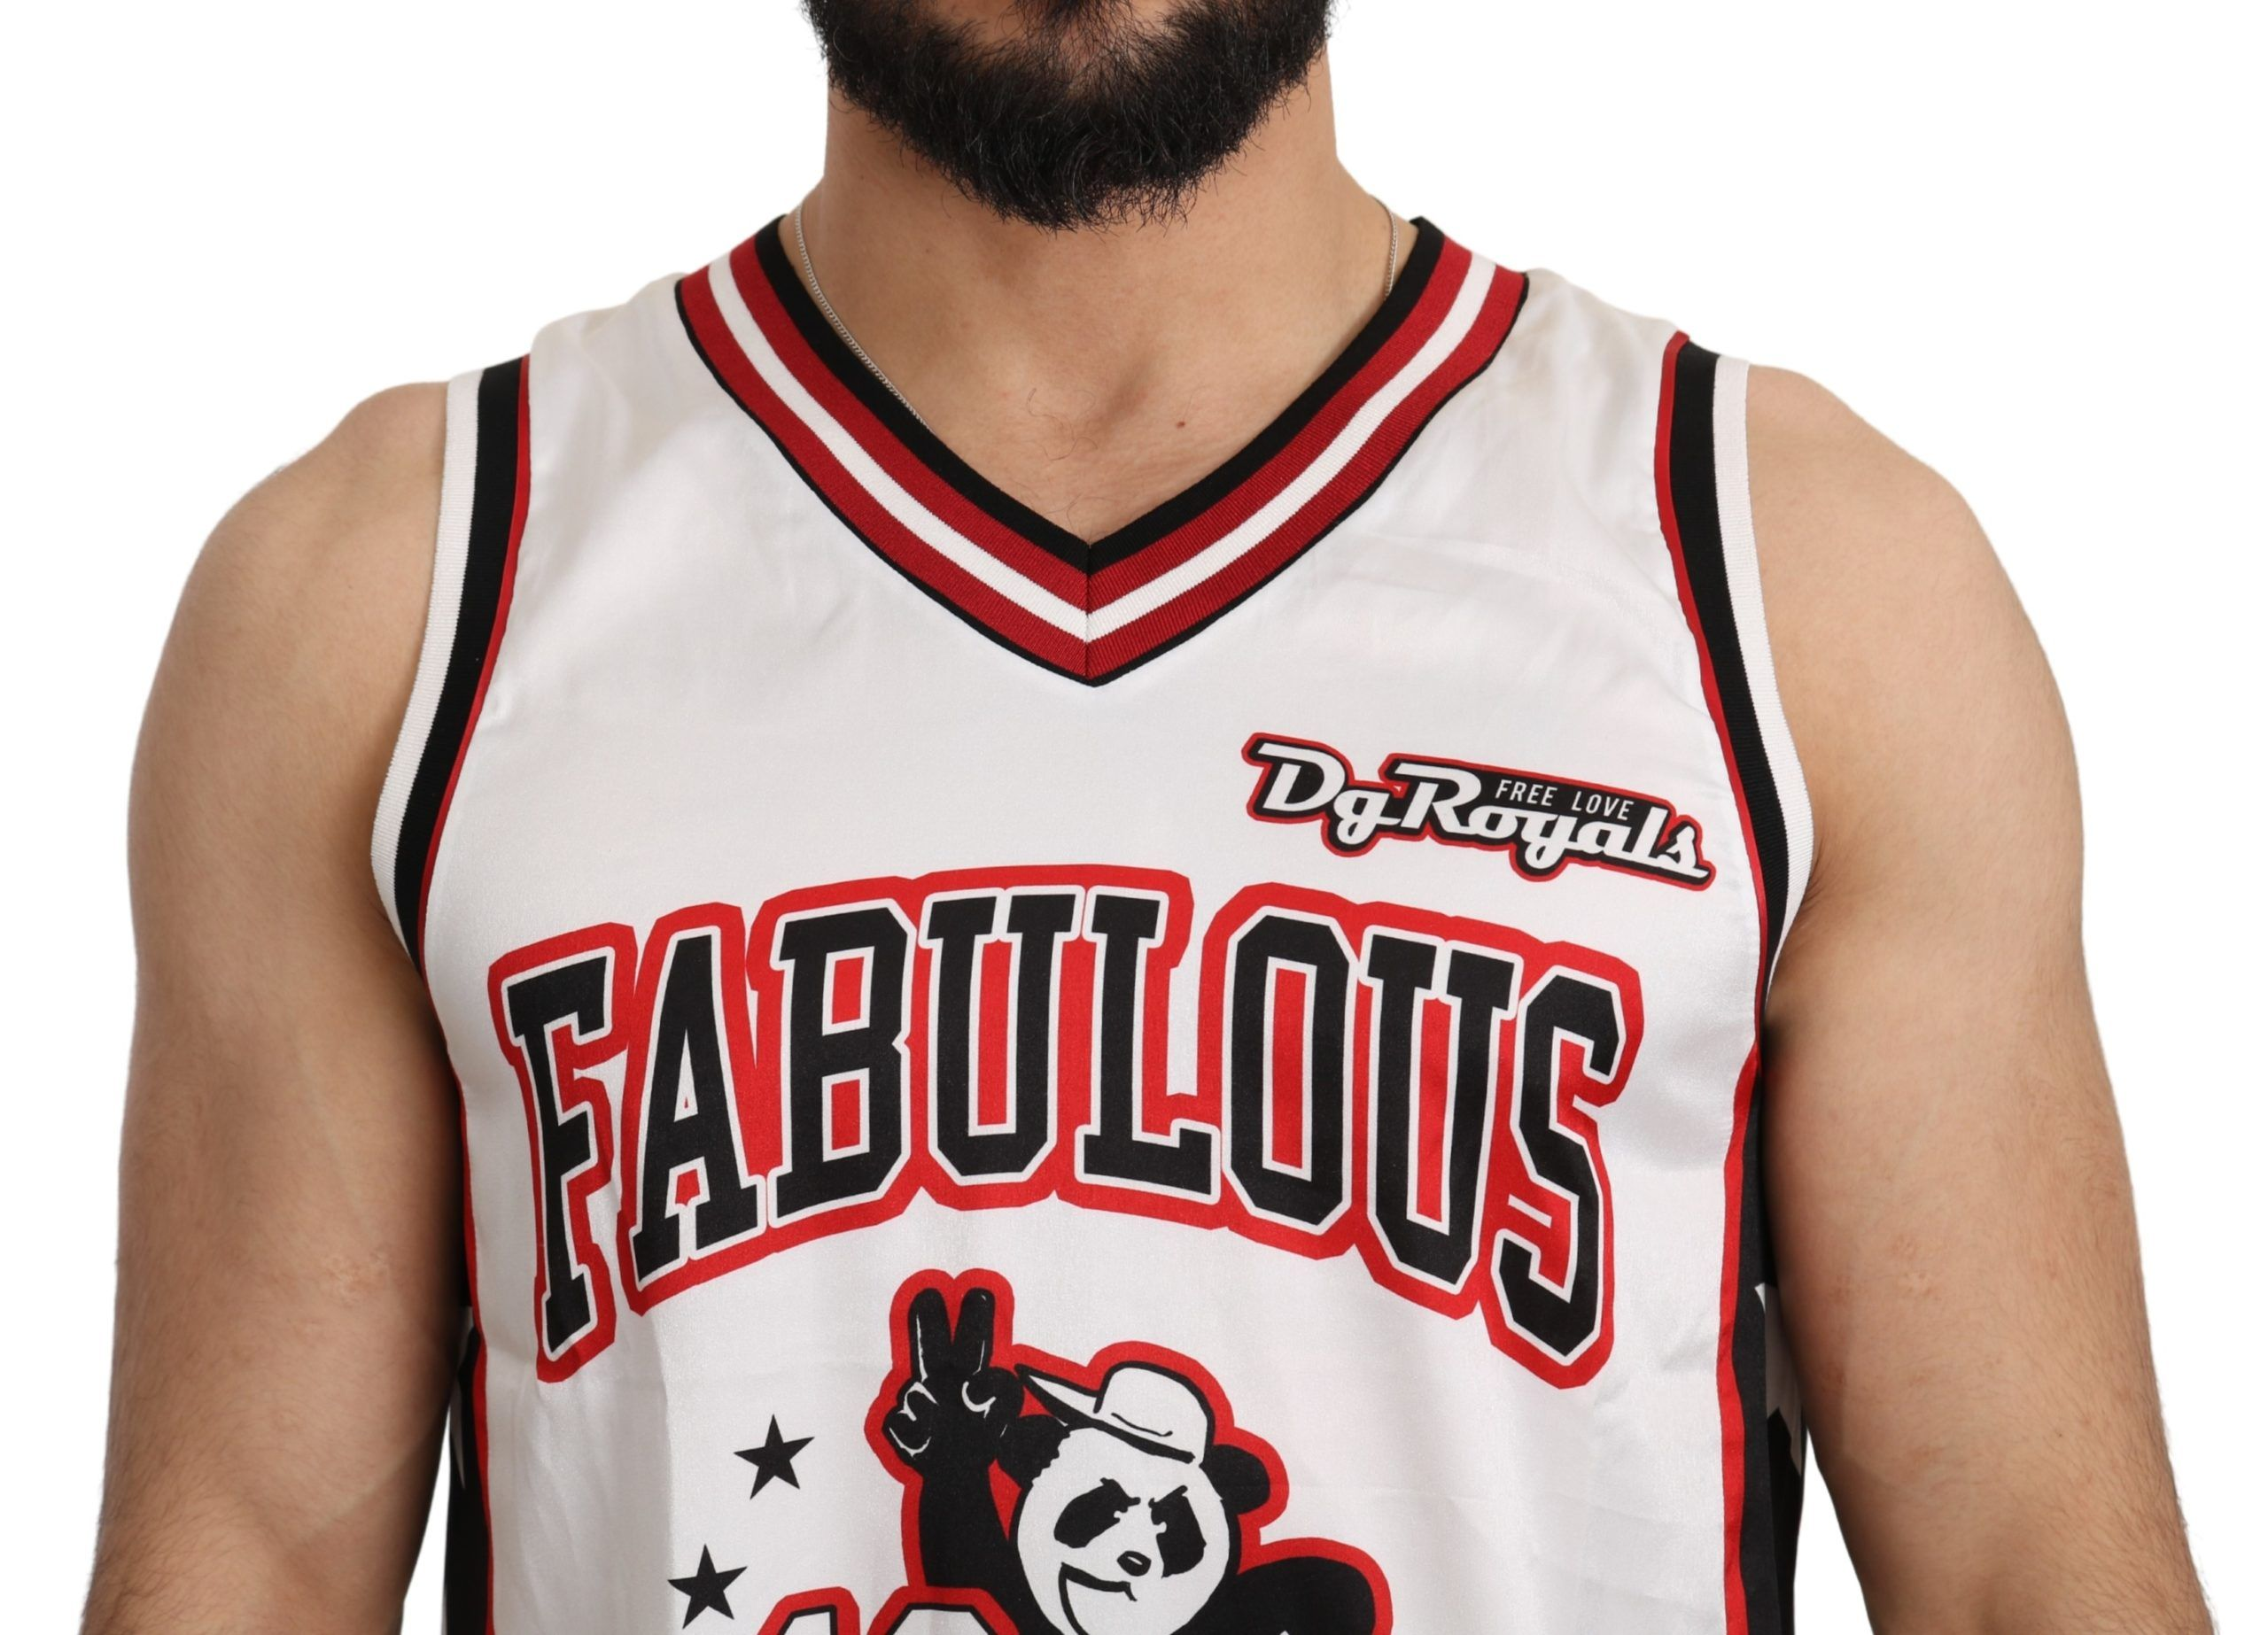 Dolce & Gabbana White Dg Royals Tank Top T-Shirt